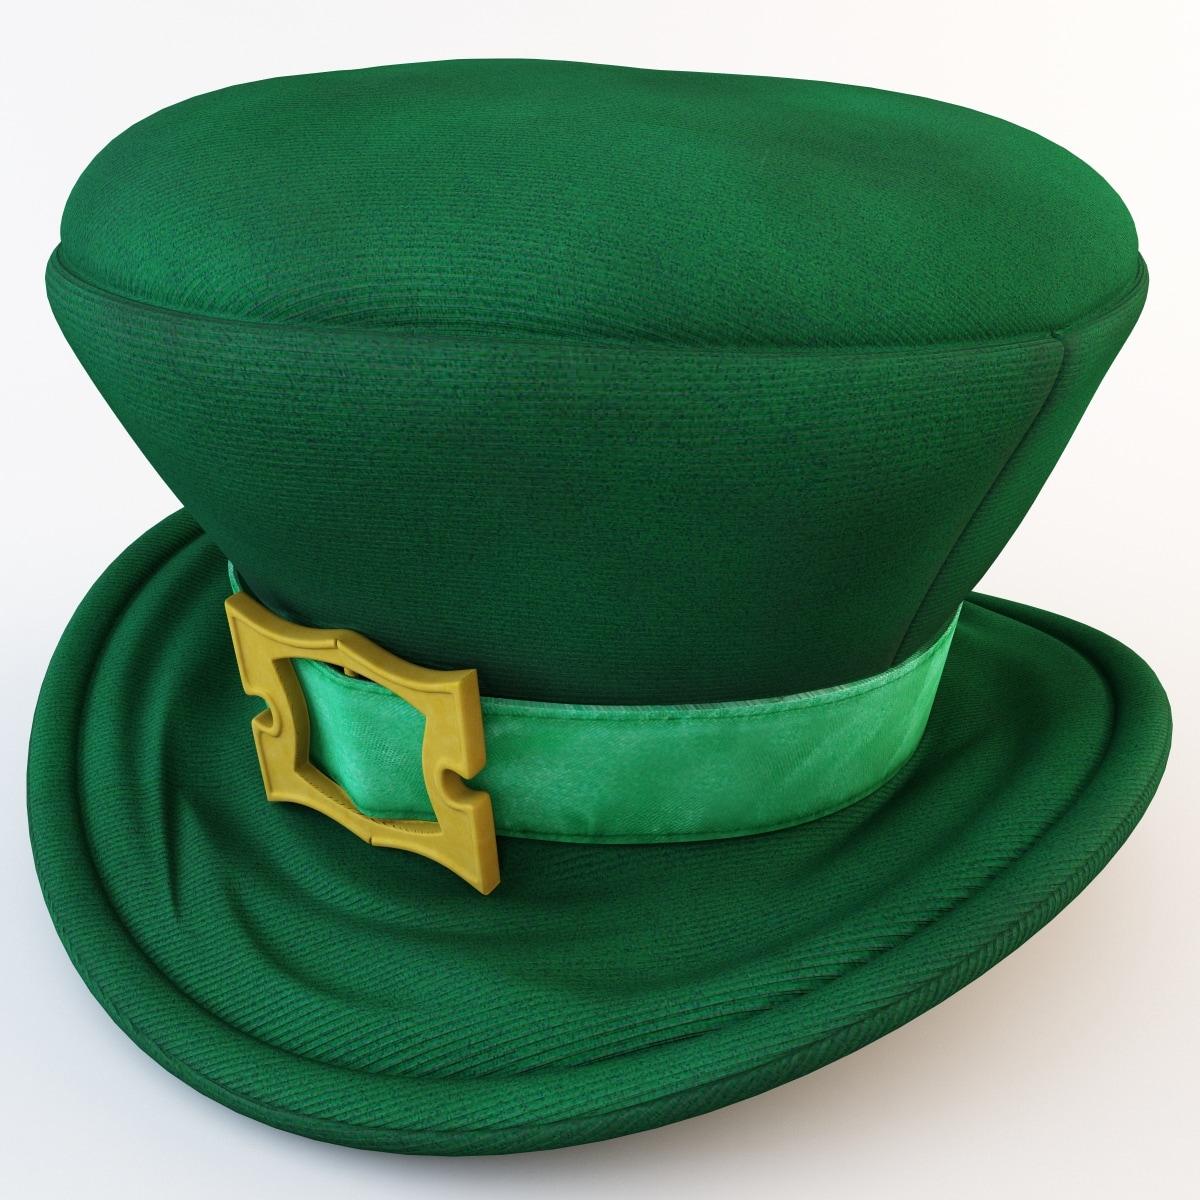 3ds max green leprechaun hat free leprechaun clipart black and white free clipart leprechaun dancing